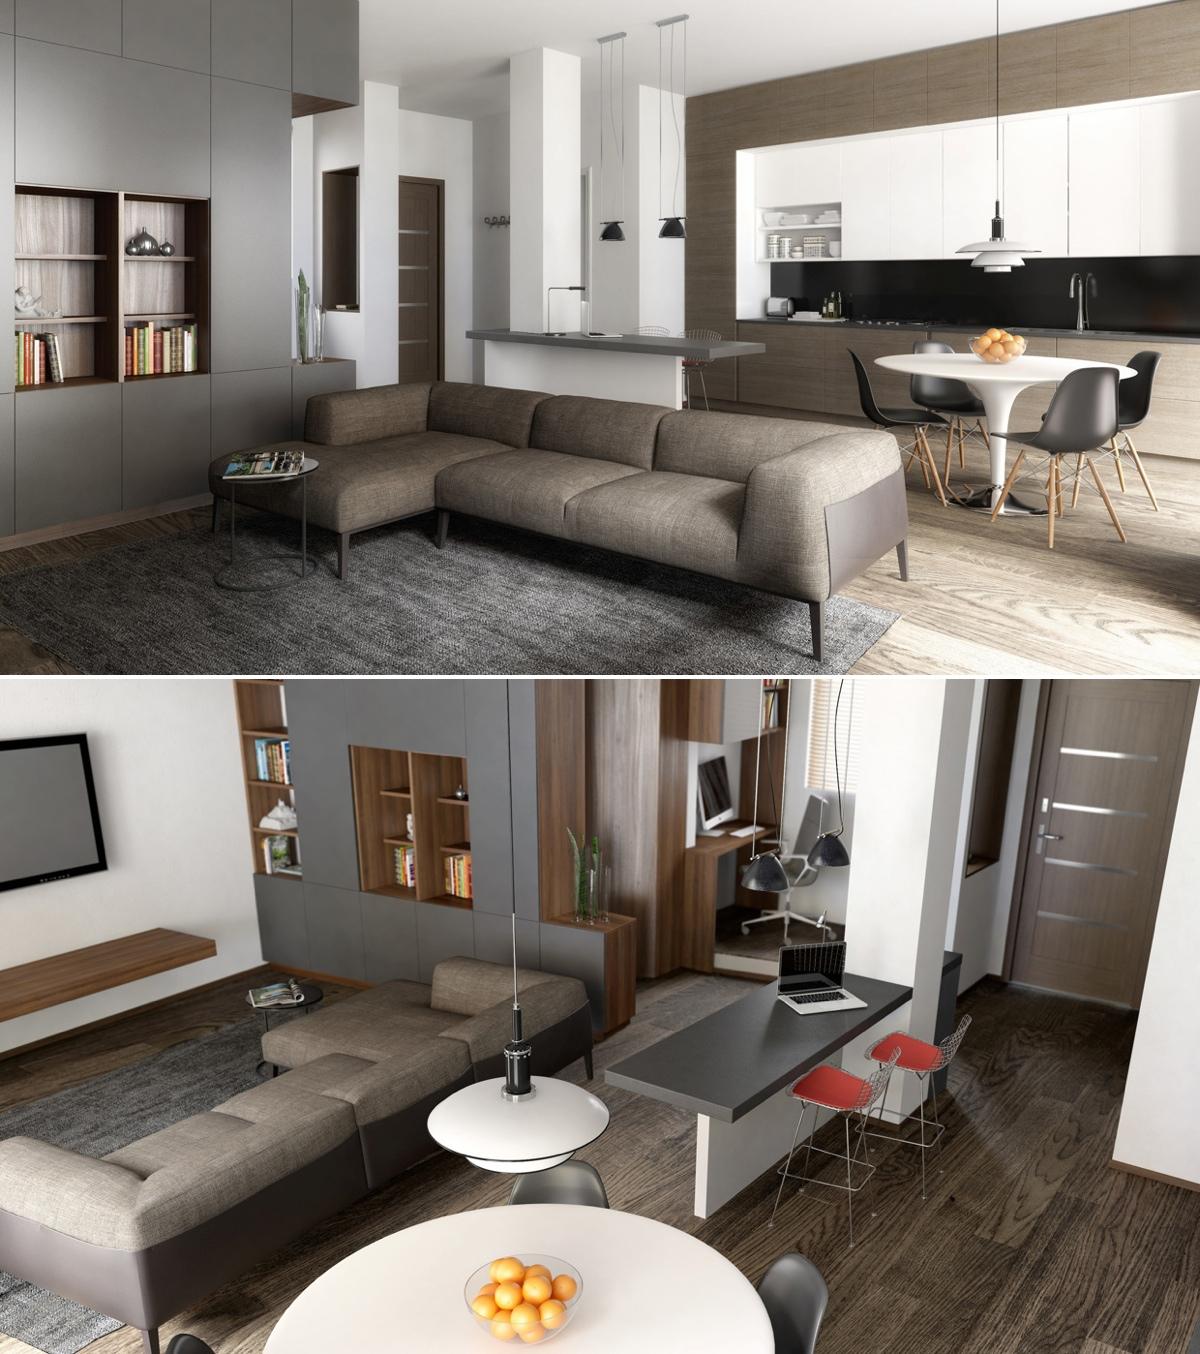 7-neutral-decor-ideas